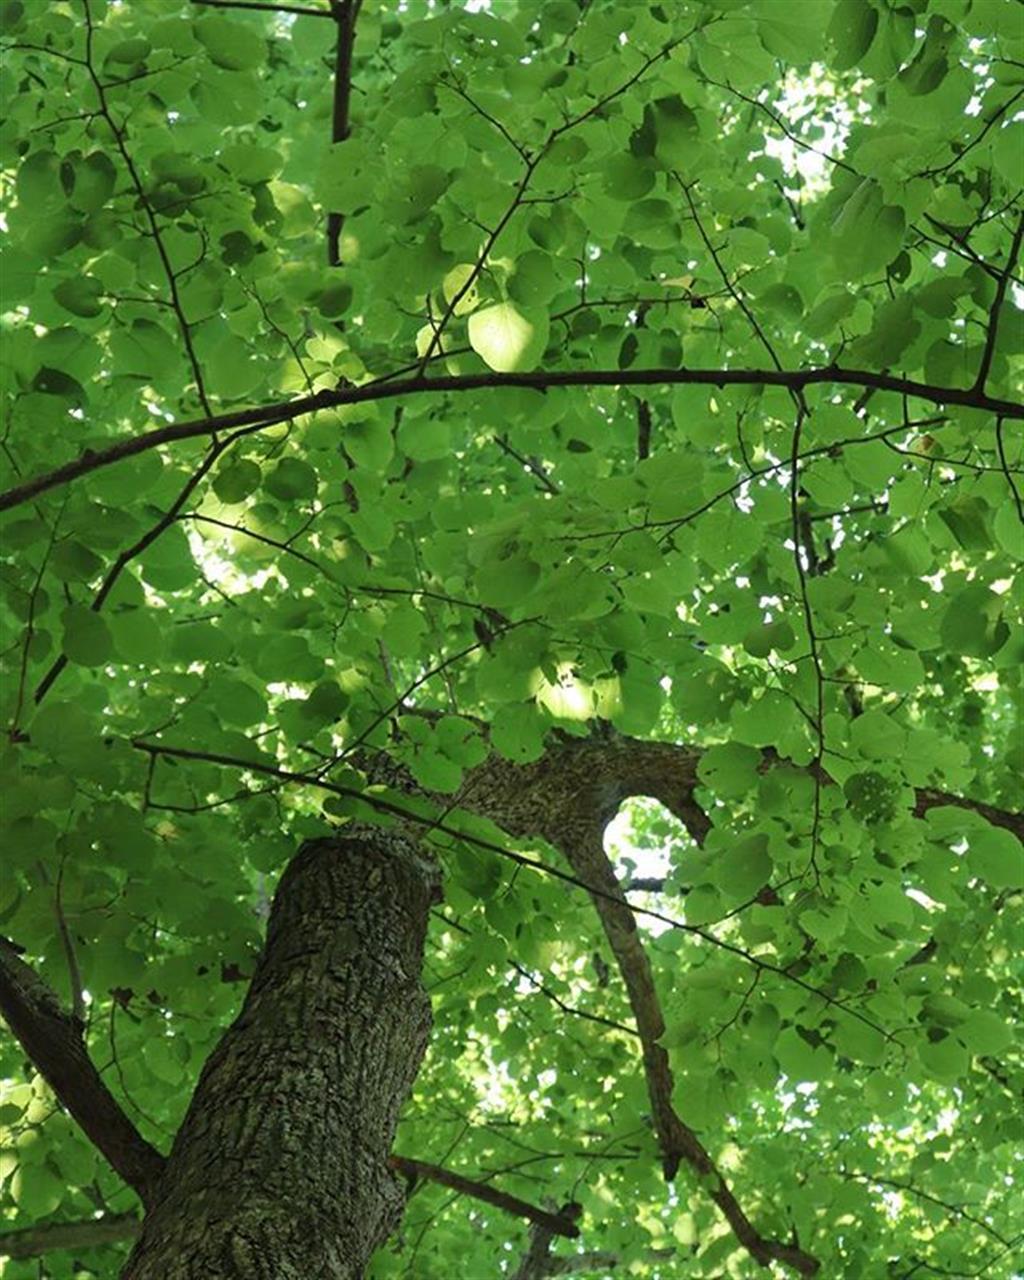 #tremanparkfalls #trees #leaves #ithaca l